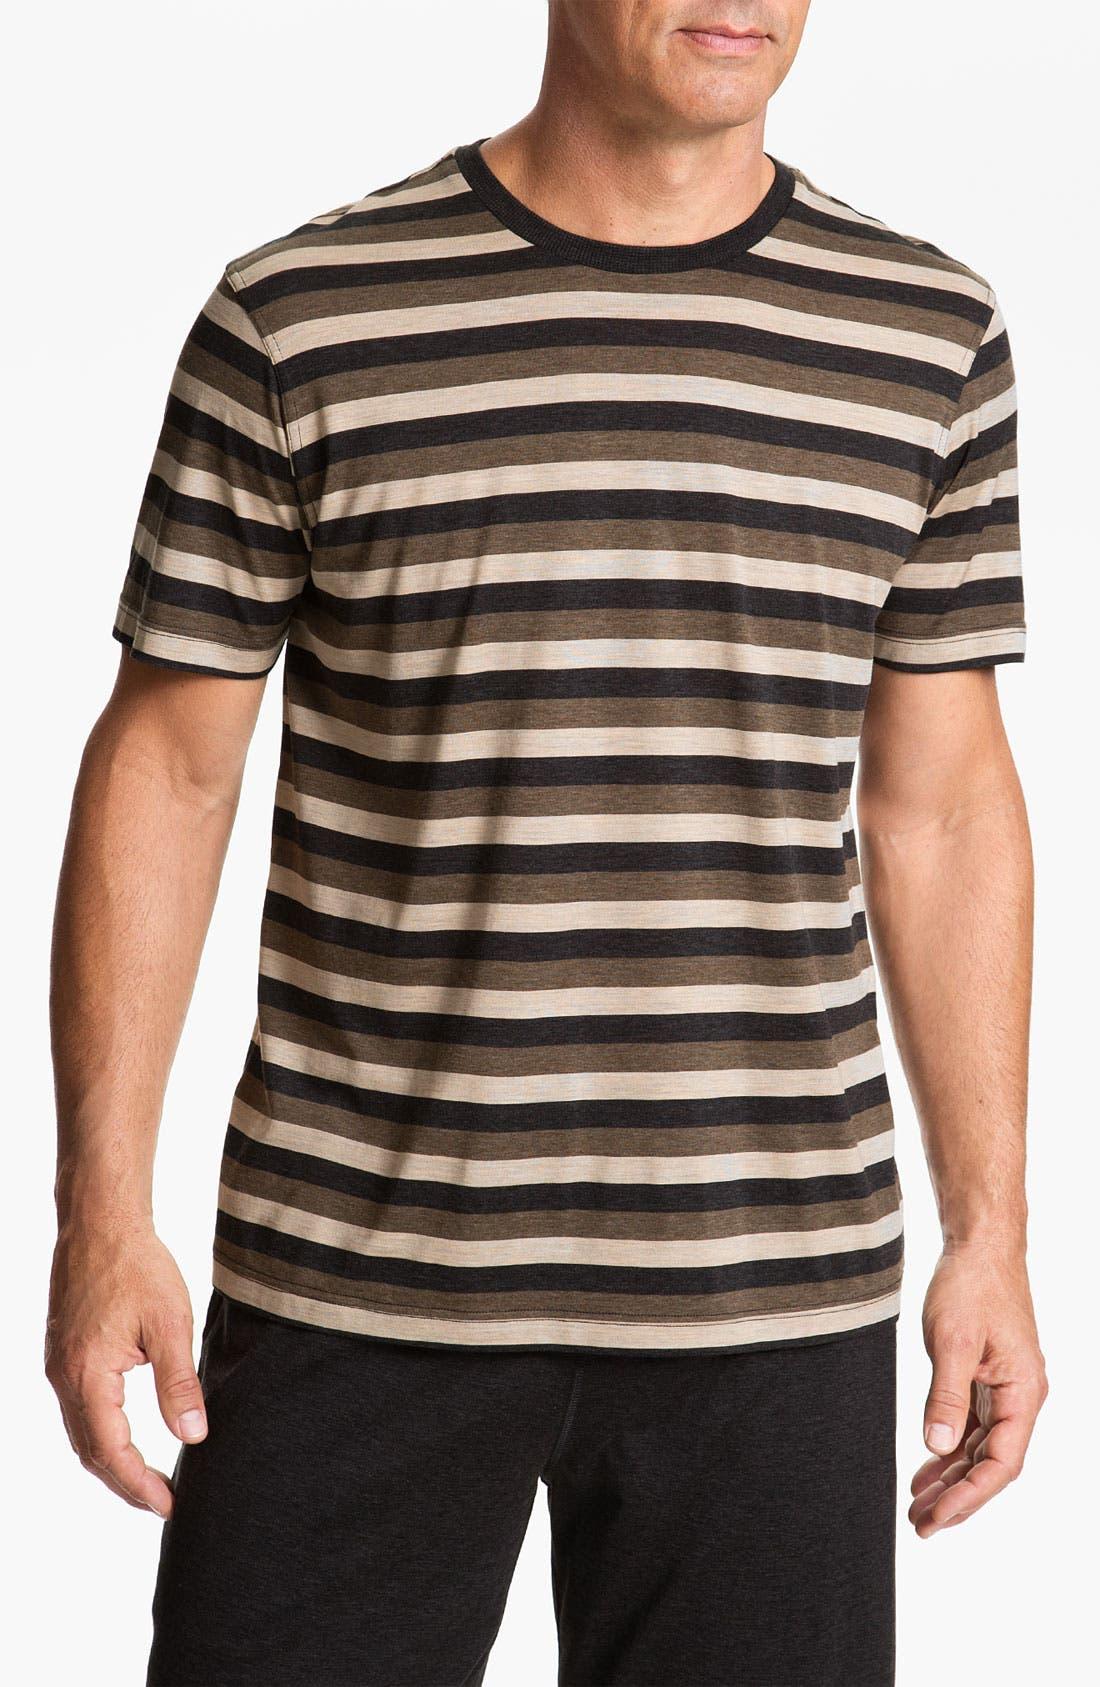 Alternate Image 1 Selected - Daniel Buchler Silk Blend Heathered Stripe T-Shirt